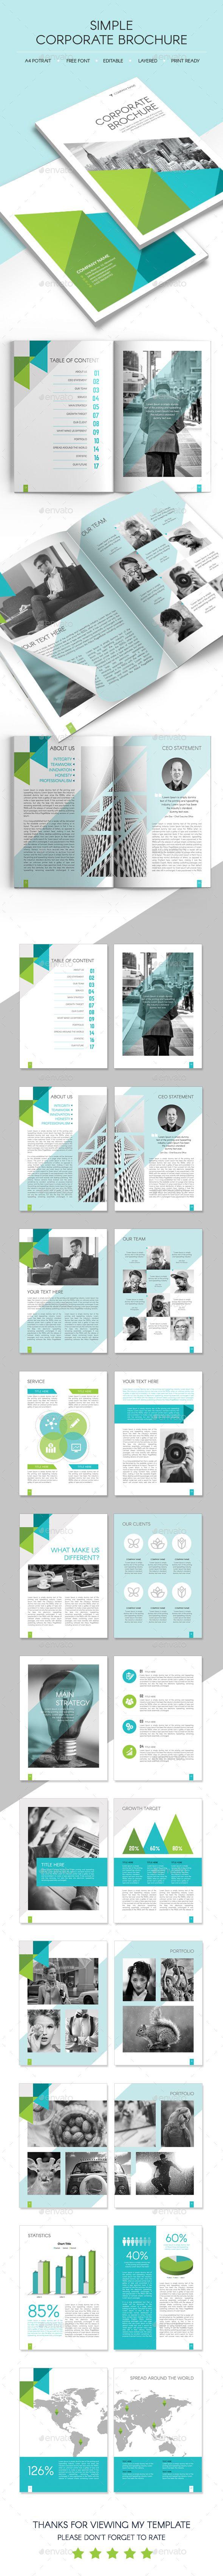 Simple Corporate Brochure Template #design Download: http://graphicriver.net/item/simple-corporate-brochure/14511212?ref=ksioks